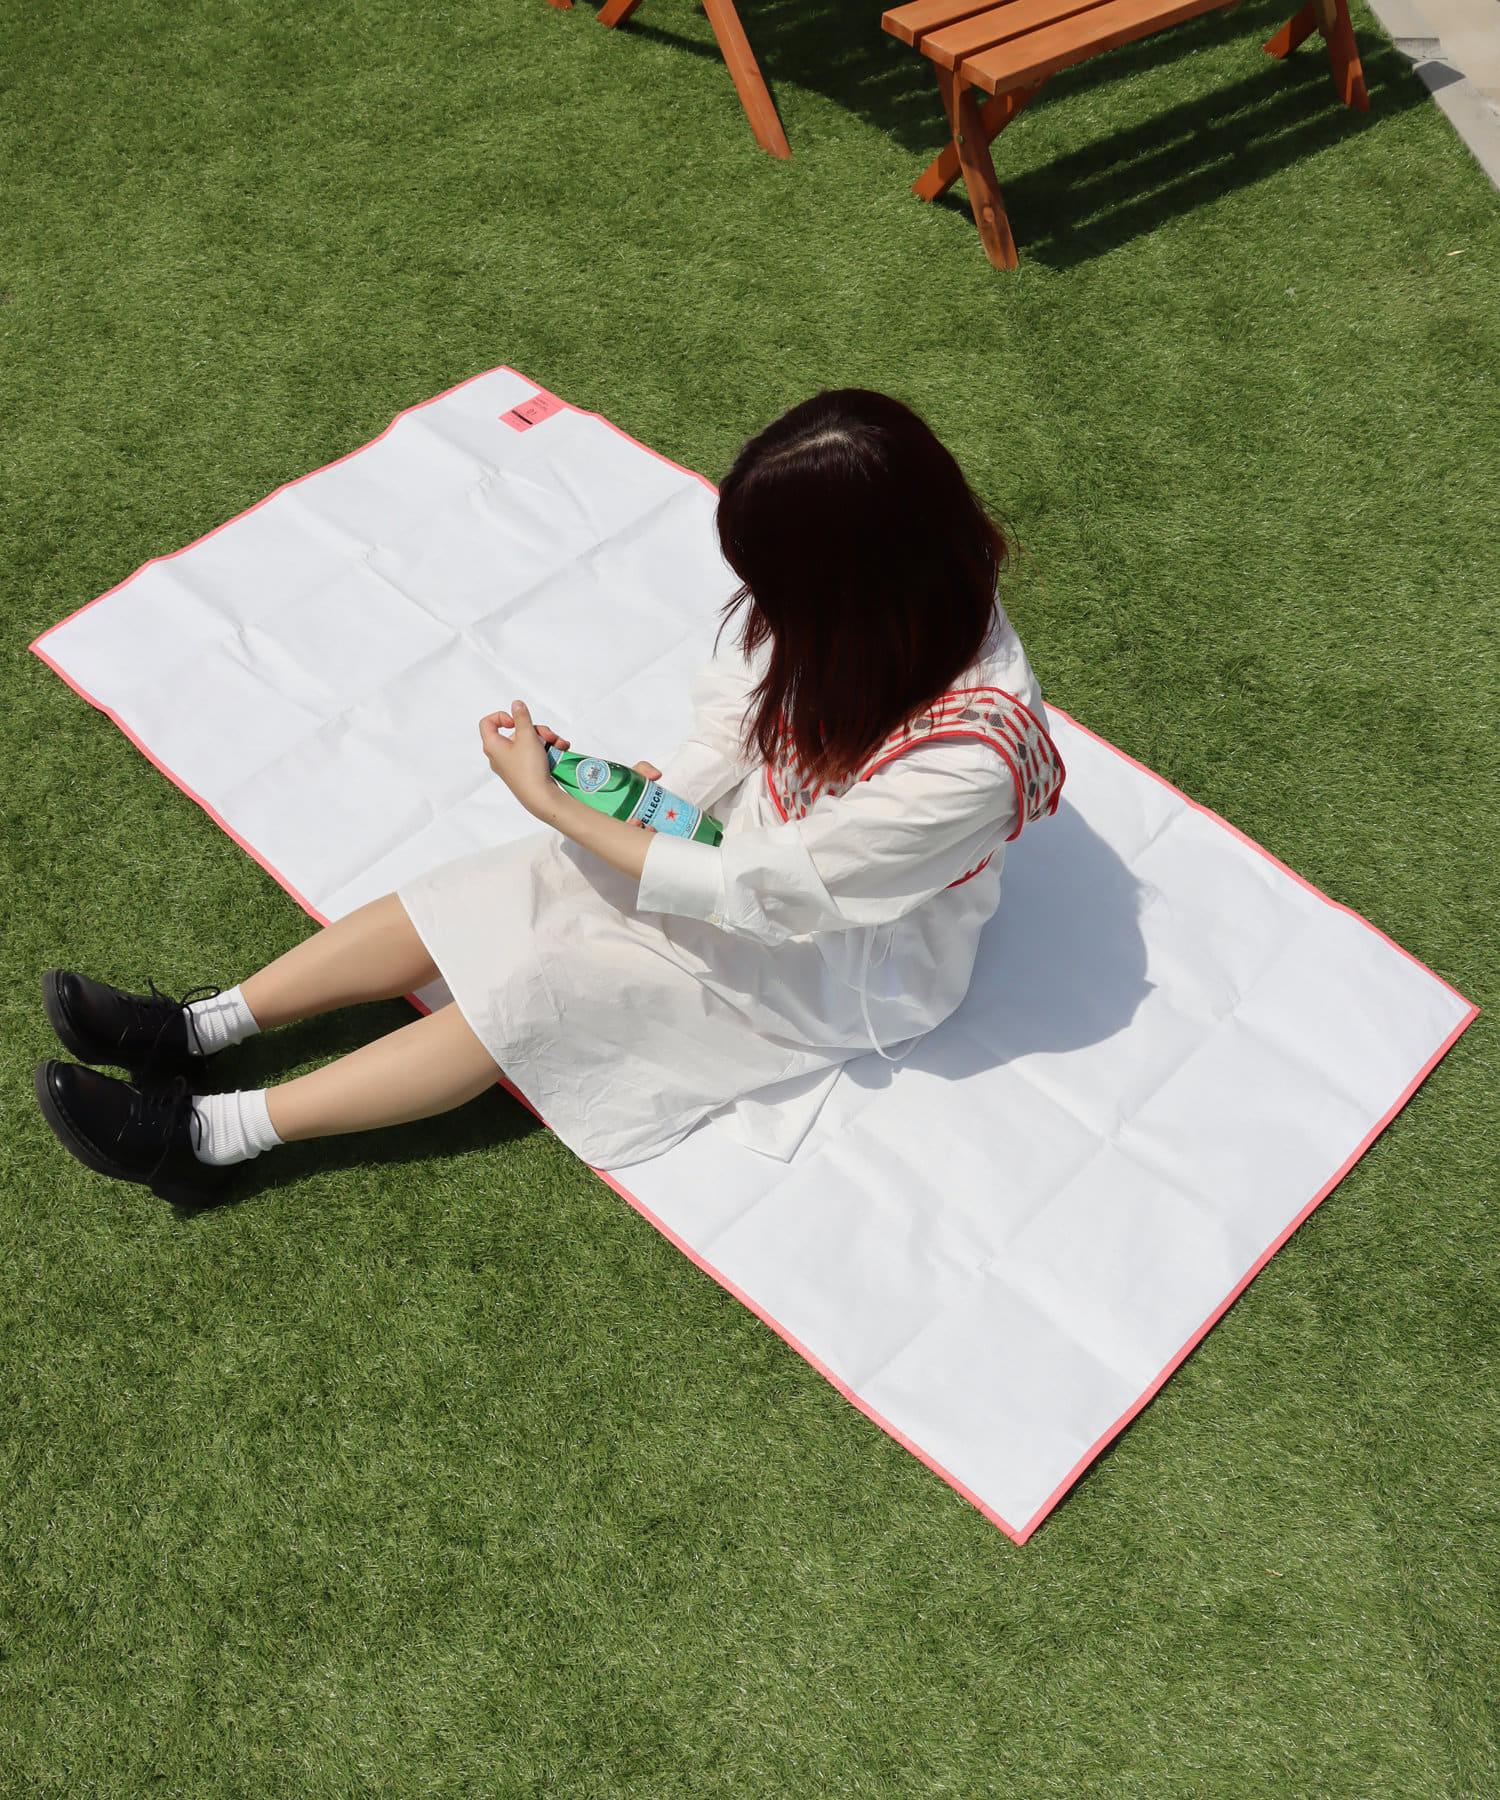 3COINS(スリーコインズ) ライフスタイル 【GIRLY PICNIC】レジャーシート【Lサイズ】 ピンク